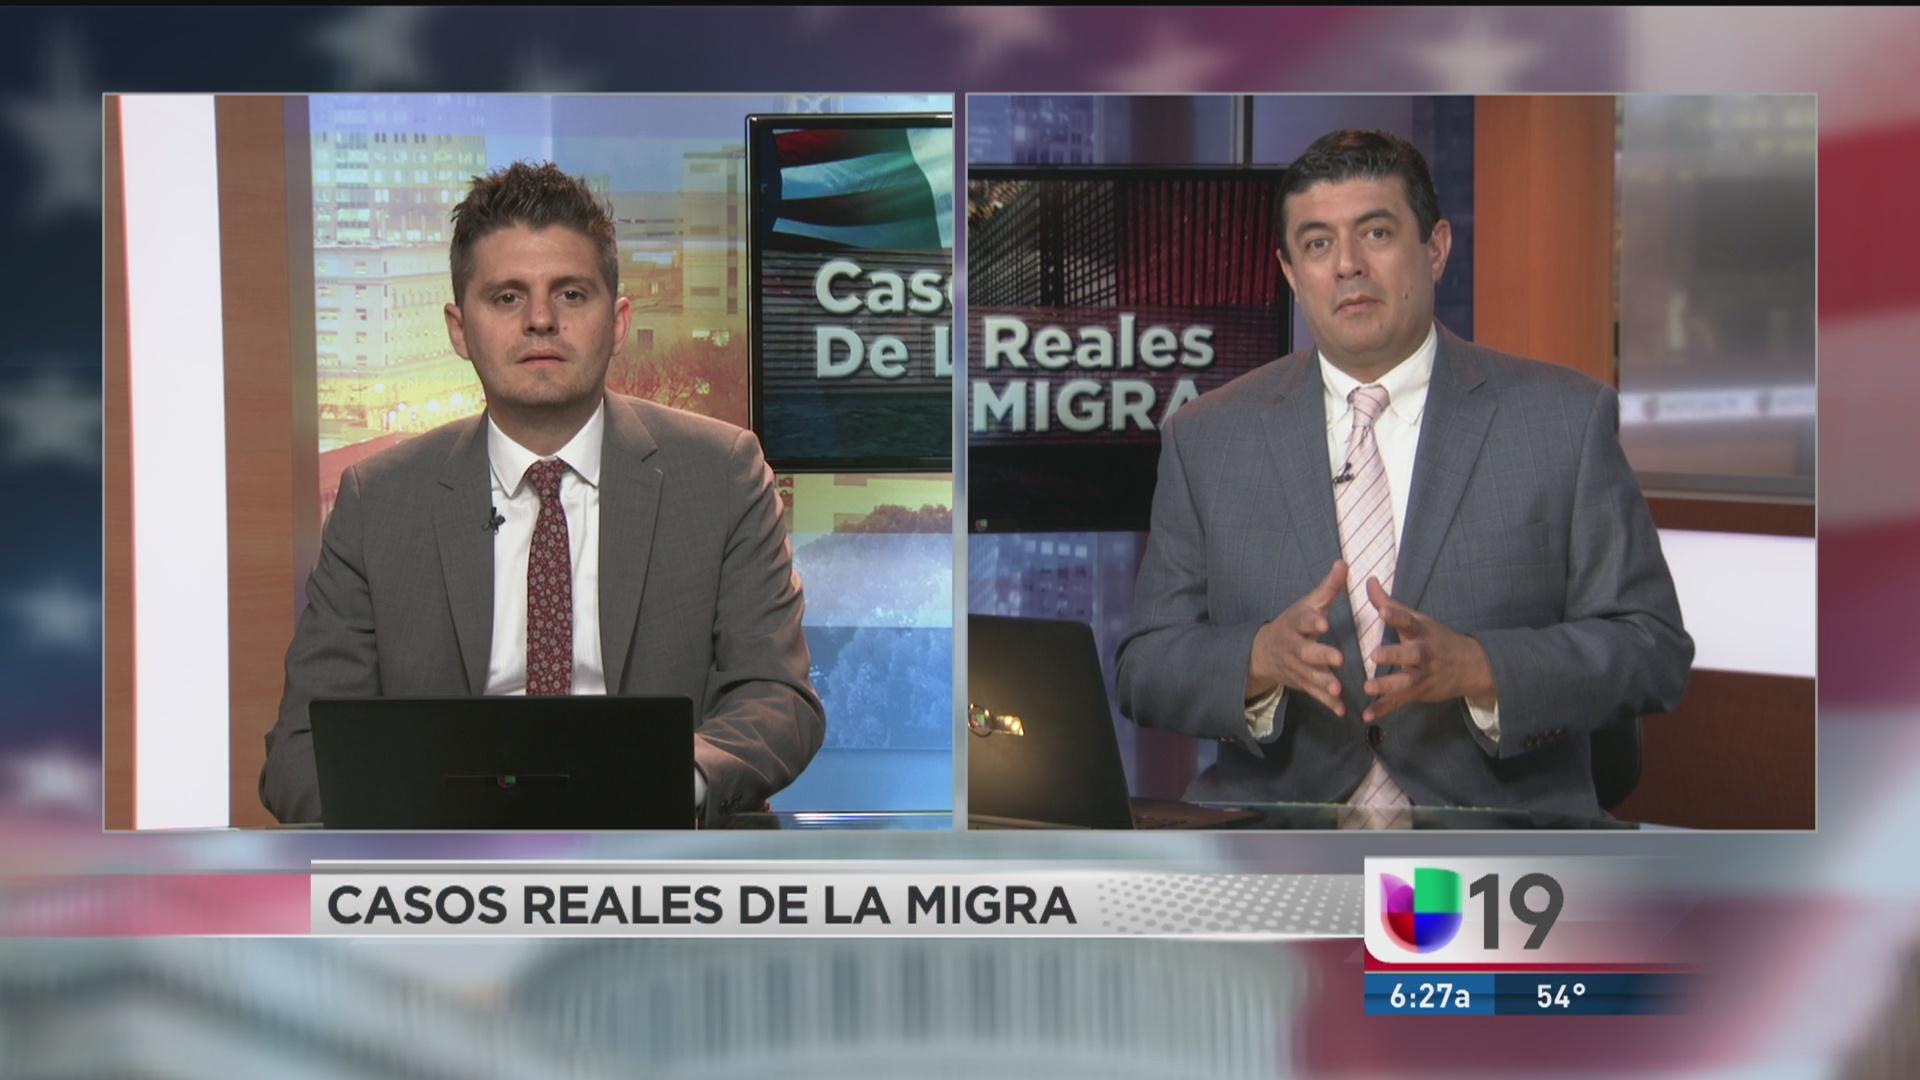 Casos reales de la migra chat de inmigraci n univision 19 univision - Casos de alcoholismo reales ...